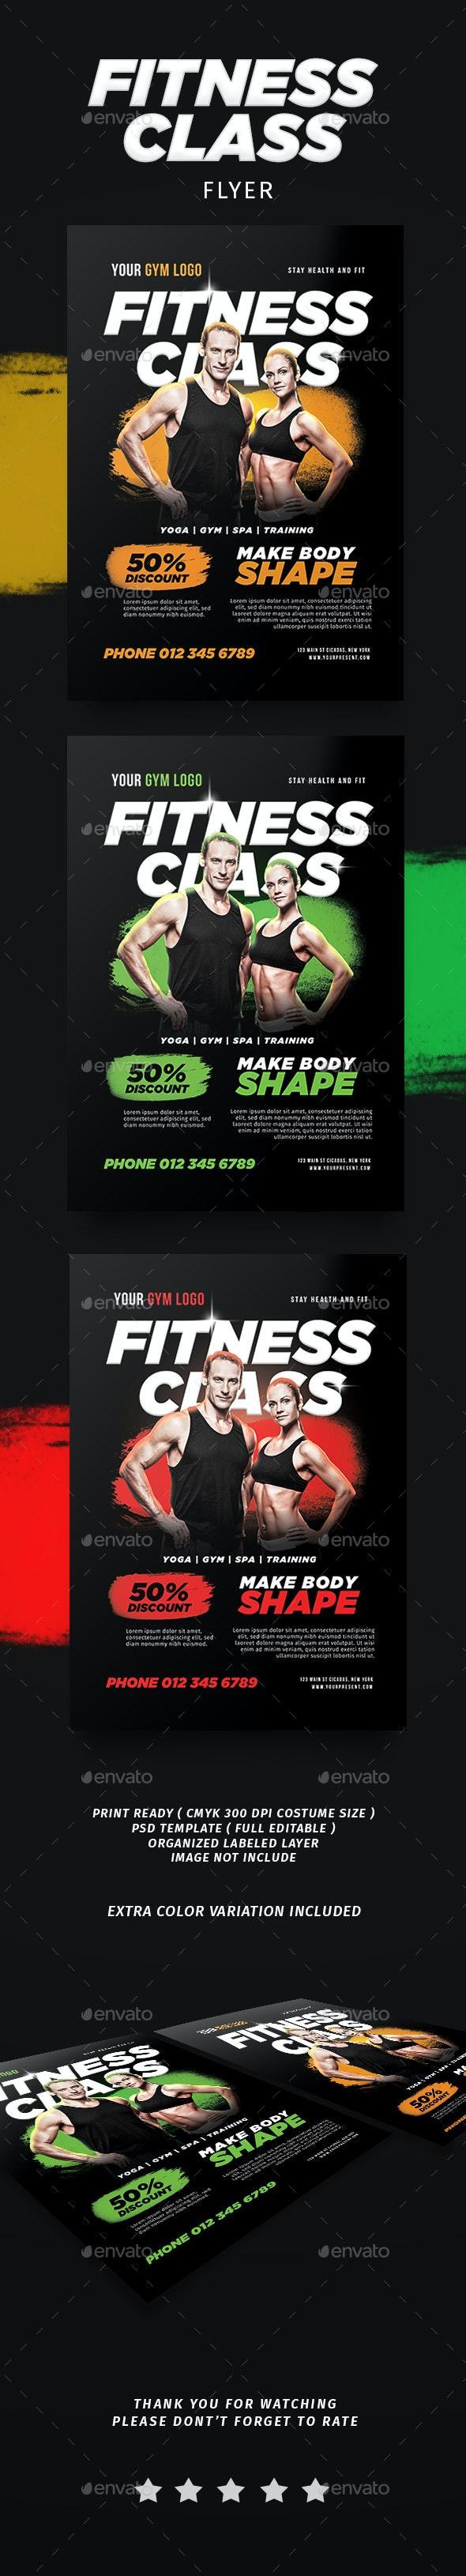 Fitness Class Flyer - Flyers Print Templates